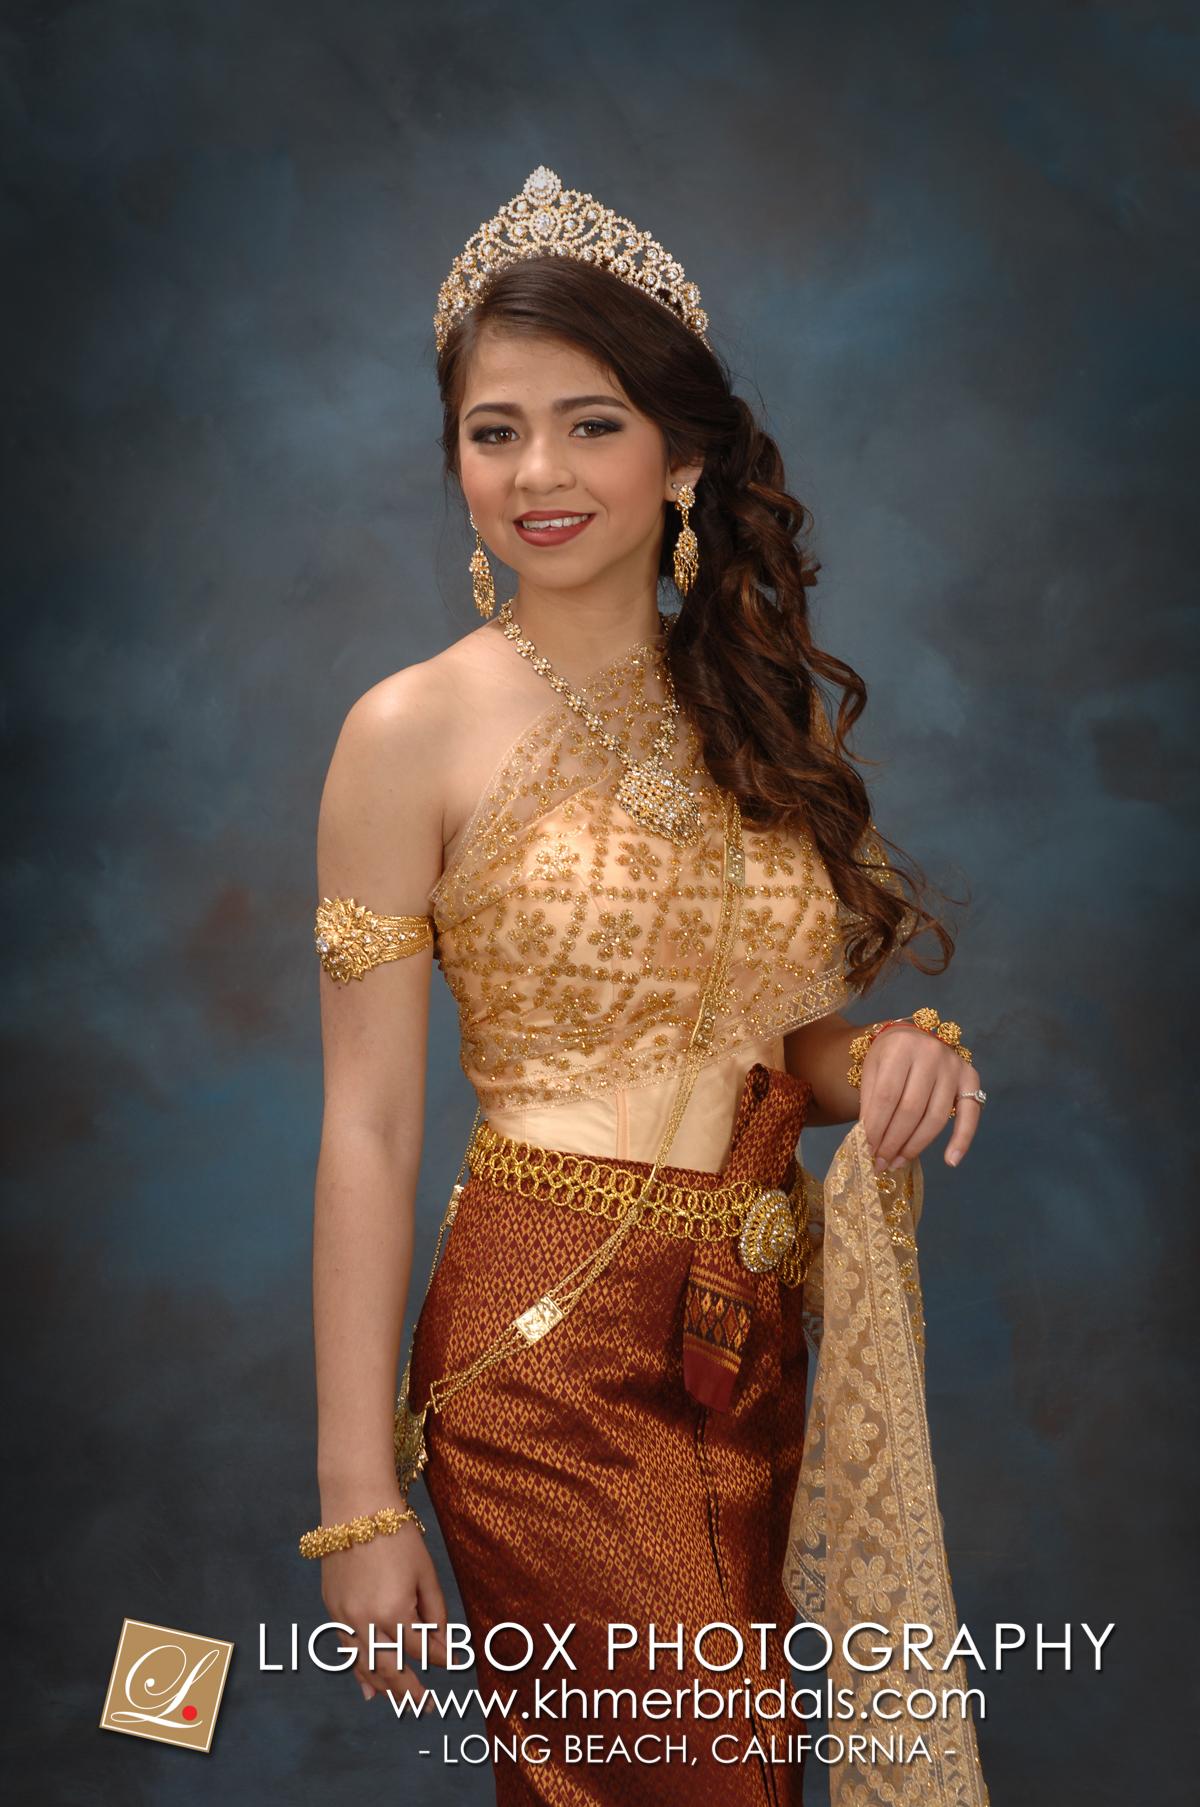 Apsara Khmer Bridal Wedding Photography and video-213.jpg